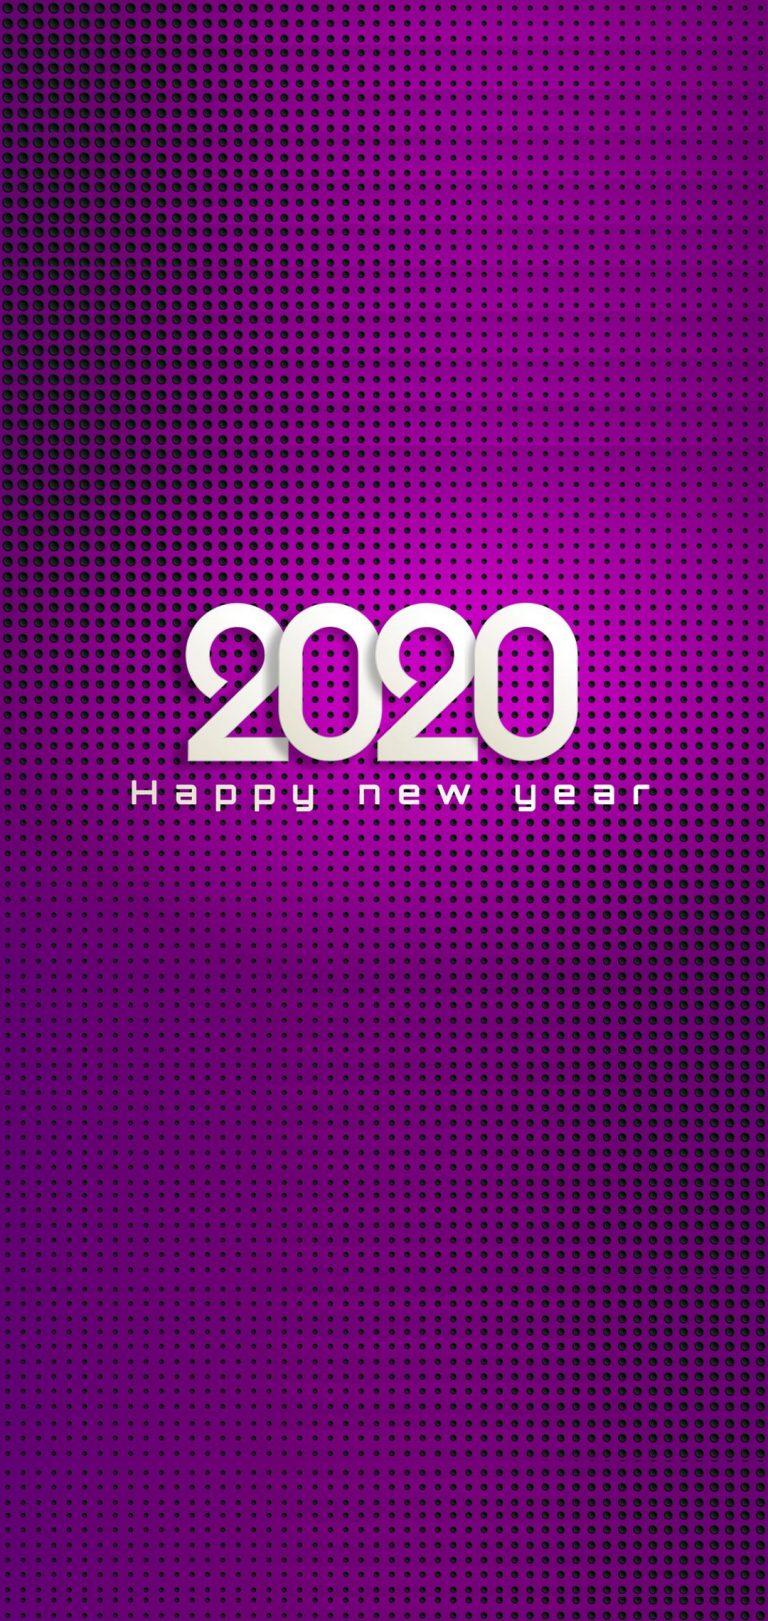 Happy New Year 2020 Phone Wallpaper 01 - [1080x2280]